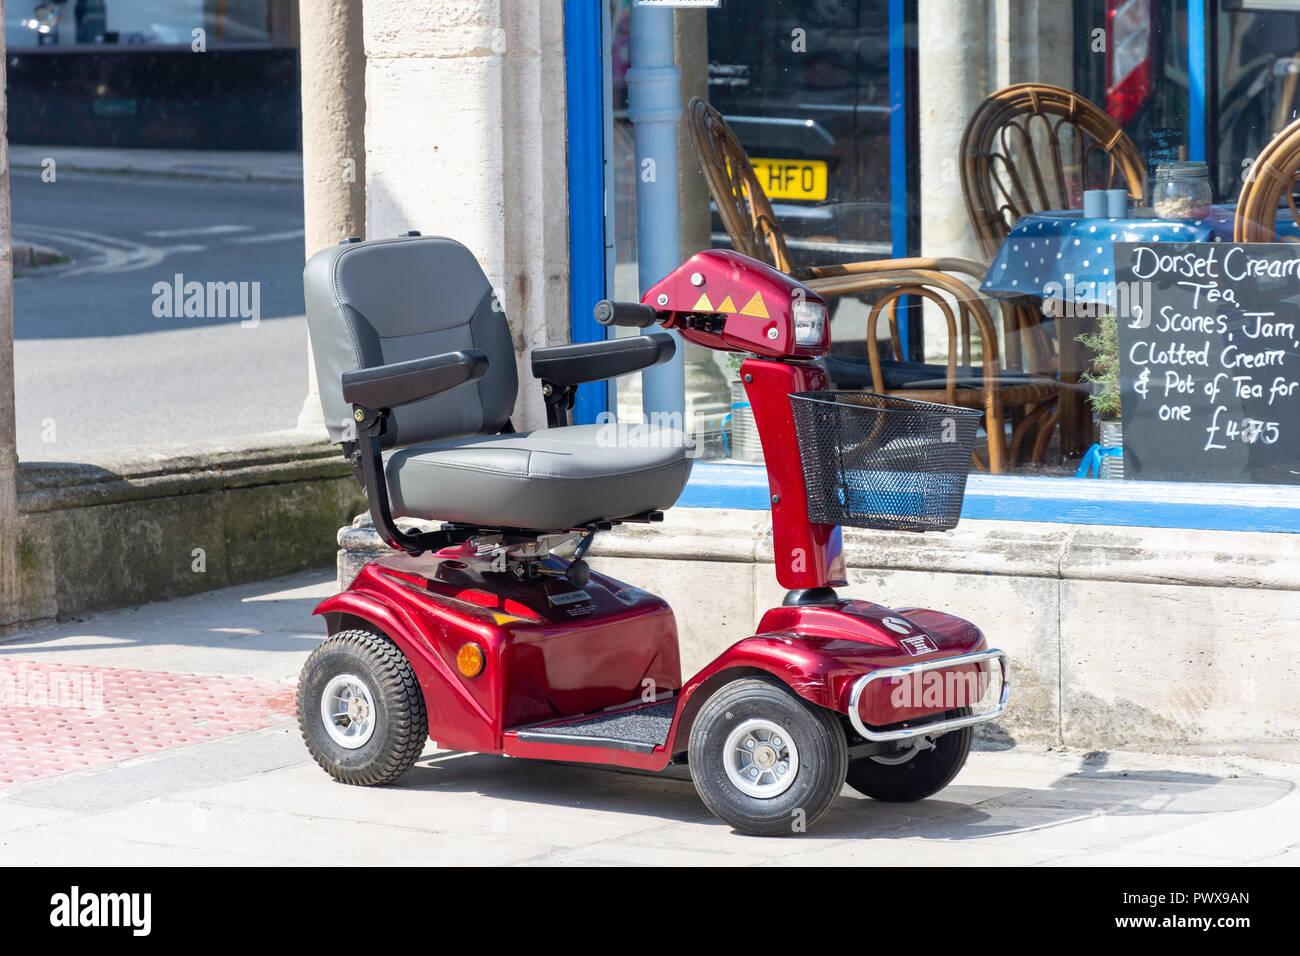 Mobilität scooter geparkt outside cafe, High Street, Swanage, Isle of Purbeck, Dorset, England, Vereinigtes Königreich Stockbild